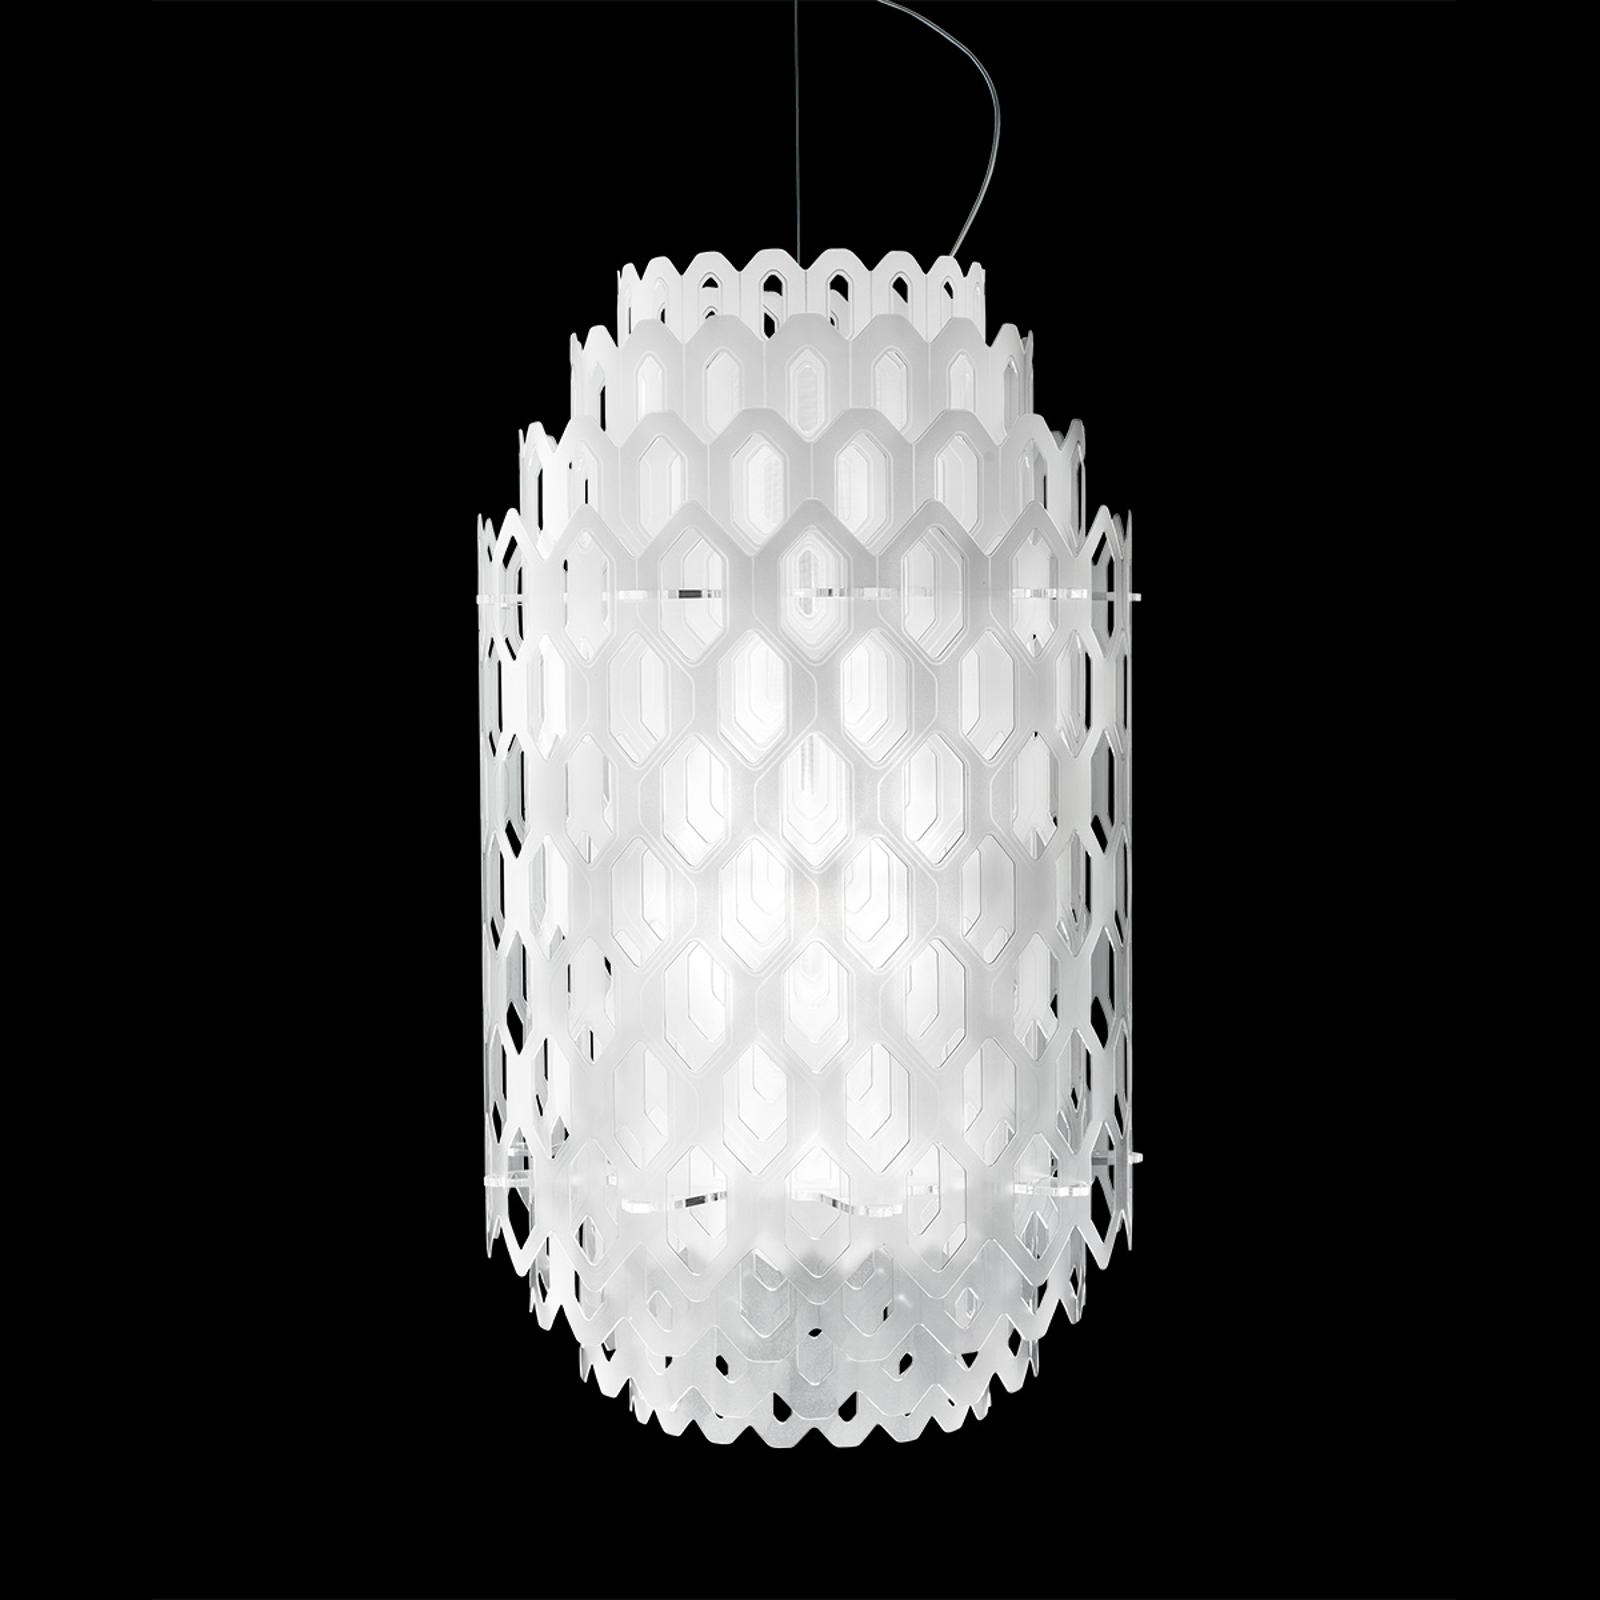 Biała designerska lampa wisząca LED CHANTAL